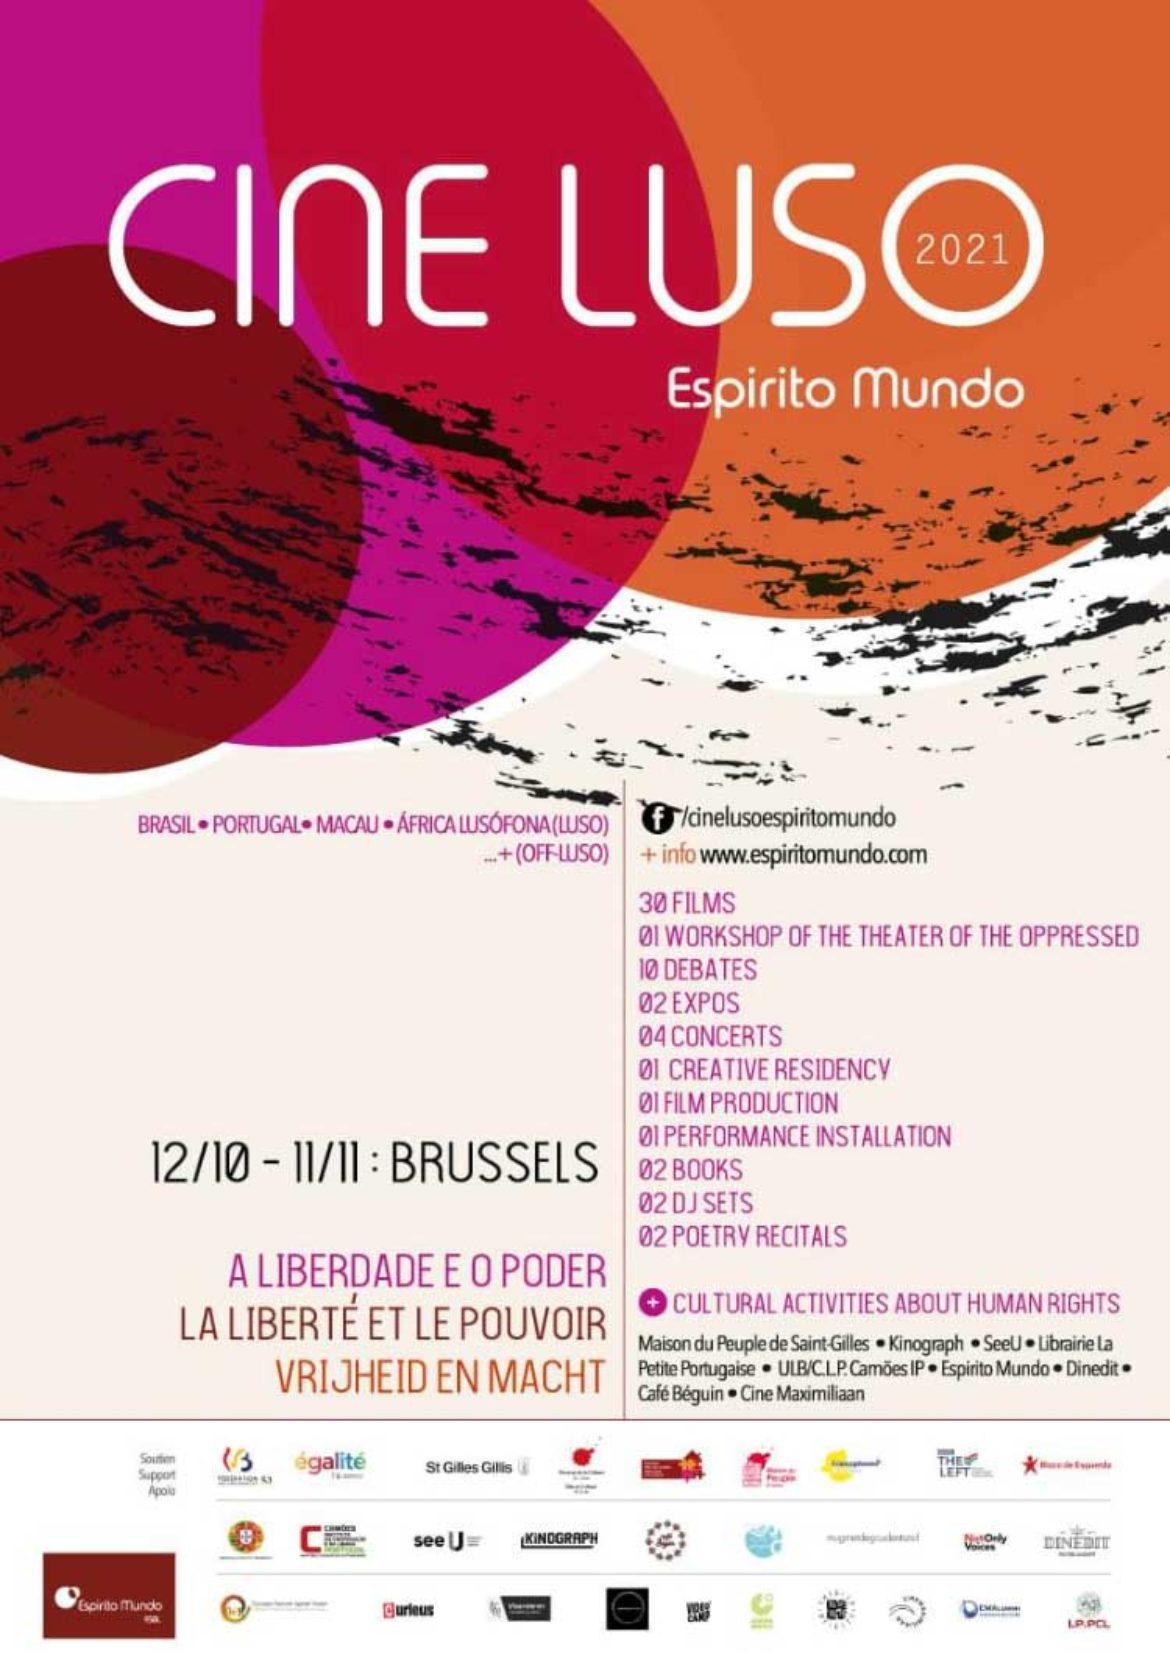 Cine Luso poster